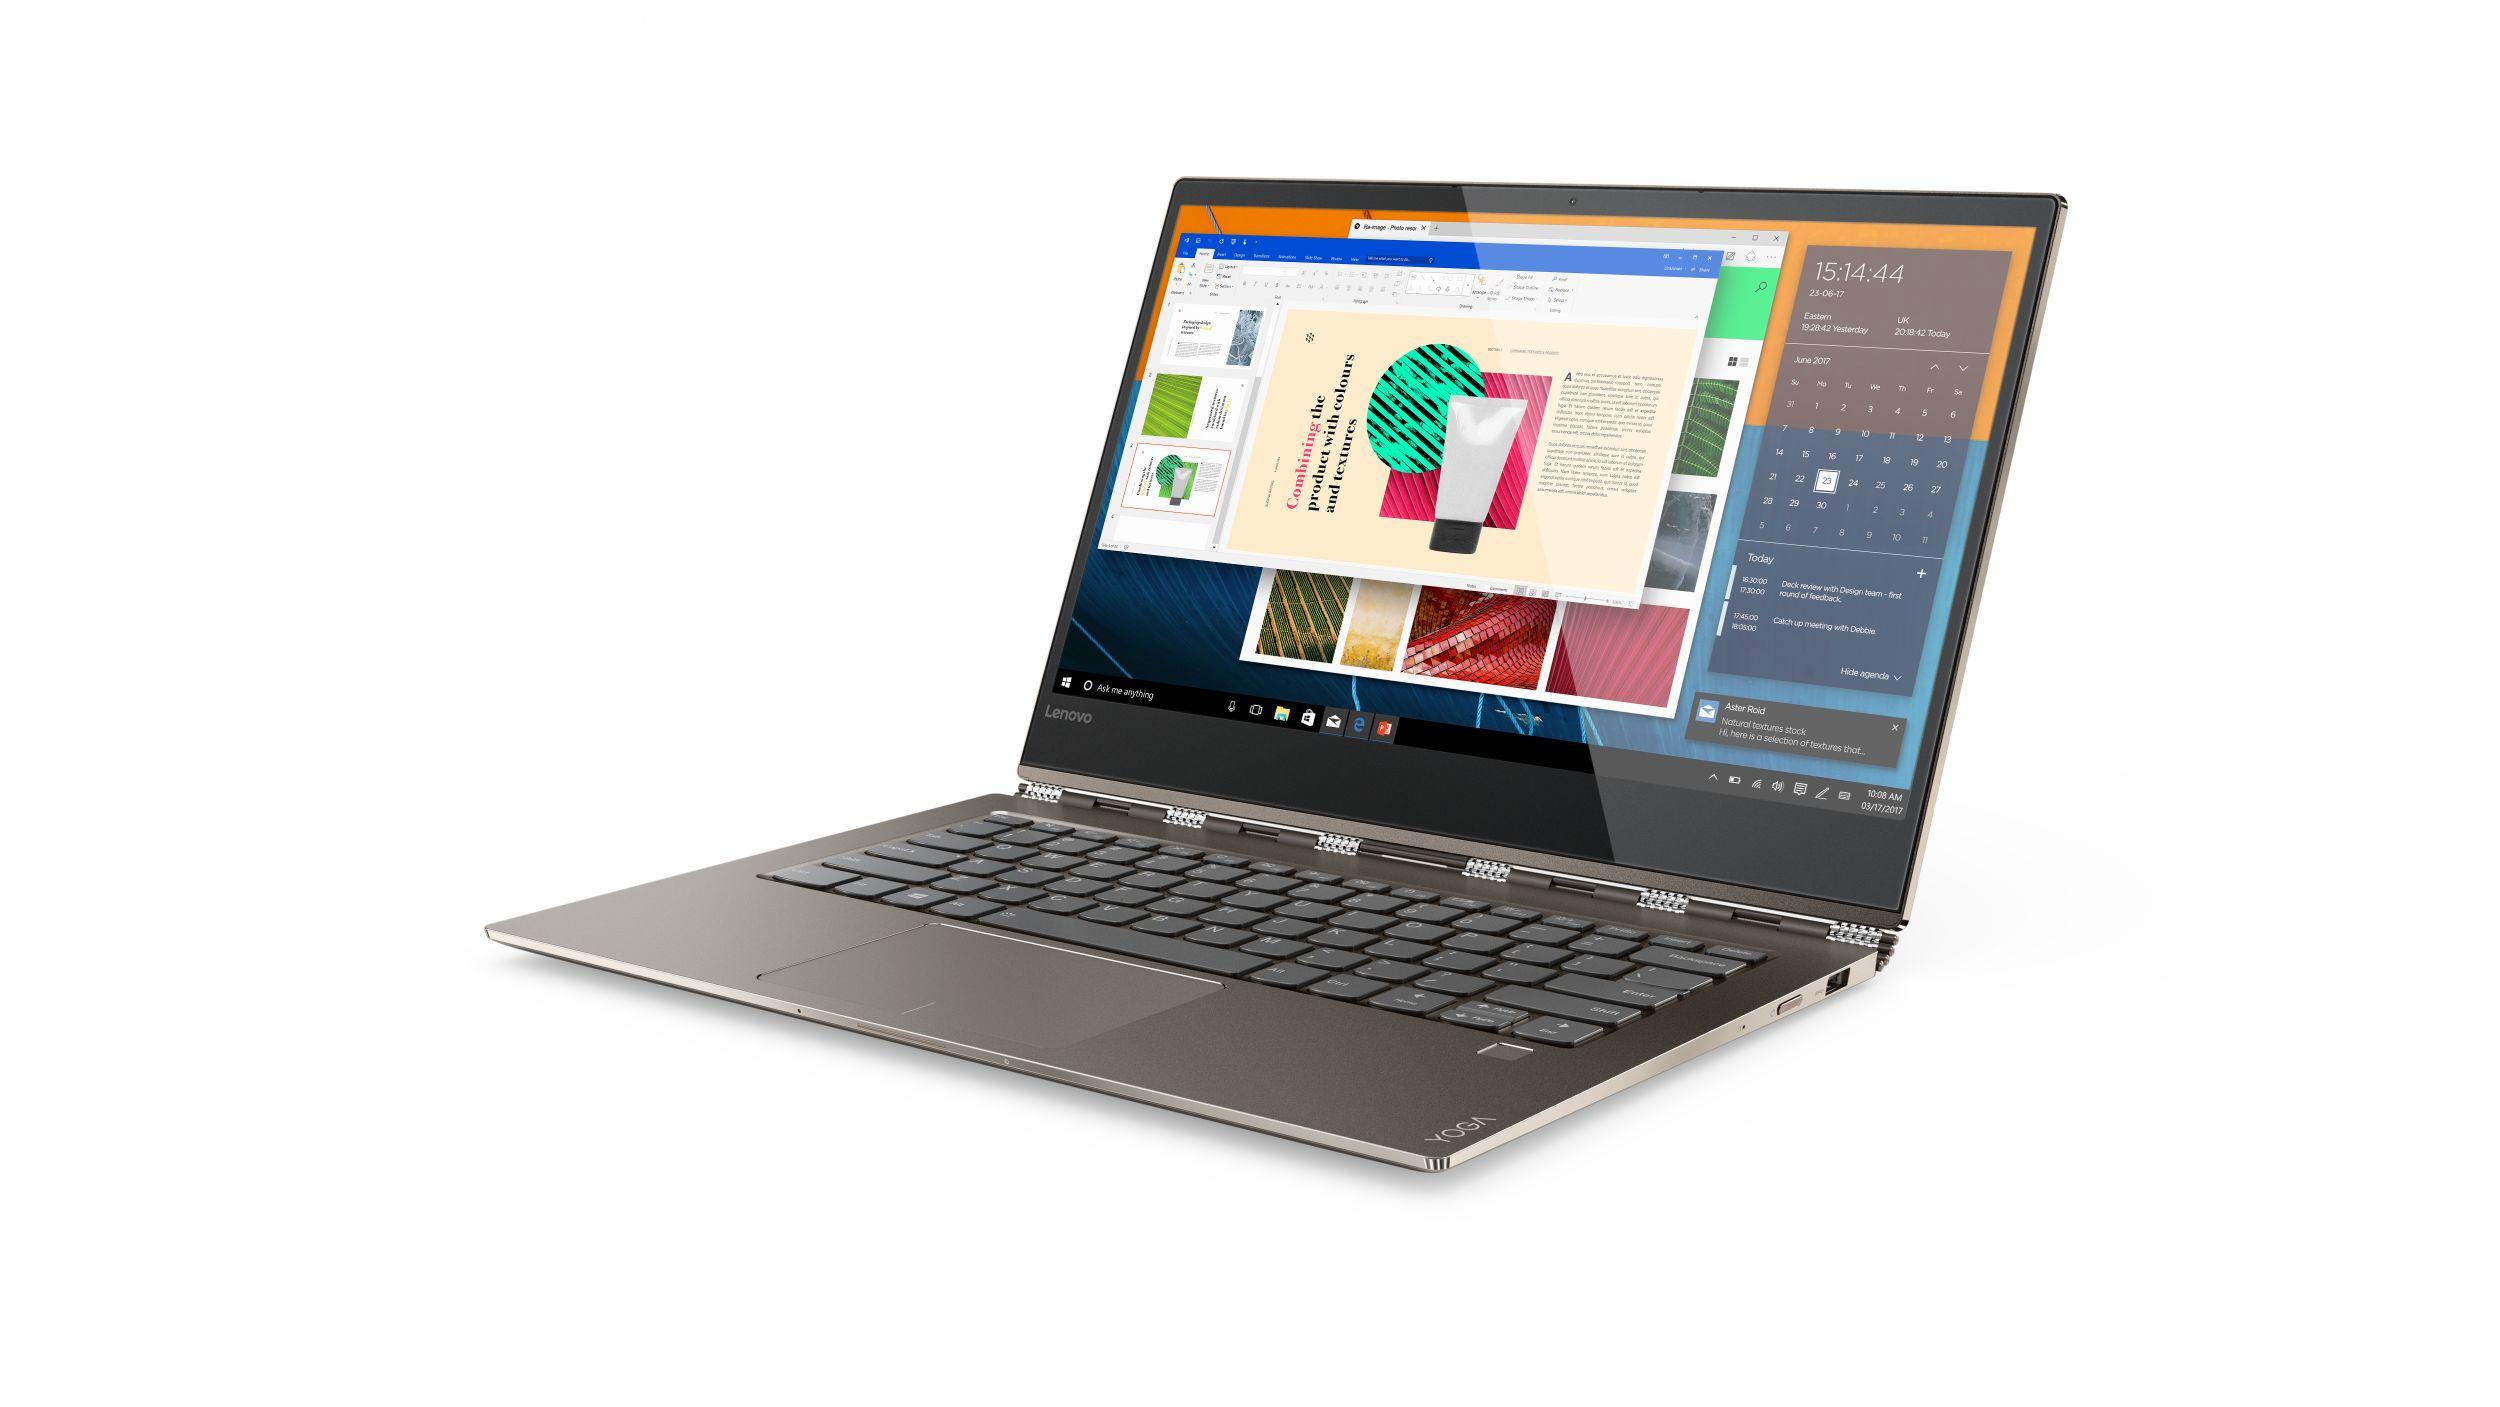 "Lenovo YOGA 920-13IKB i7-8550U 4,00GHz/8GB/SSD 526GB/13,9"" UHD/IPS/multitouch/ActivePen/WIN10 bronzová 80Y70020CK"